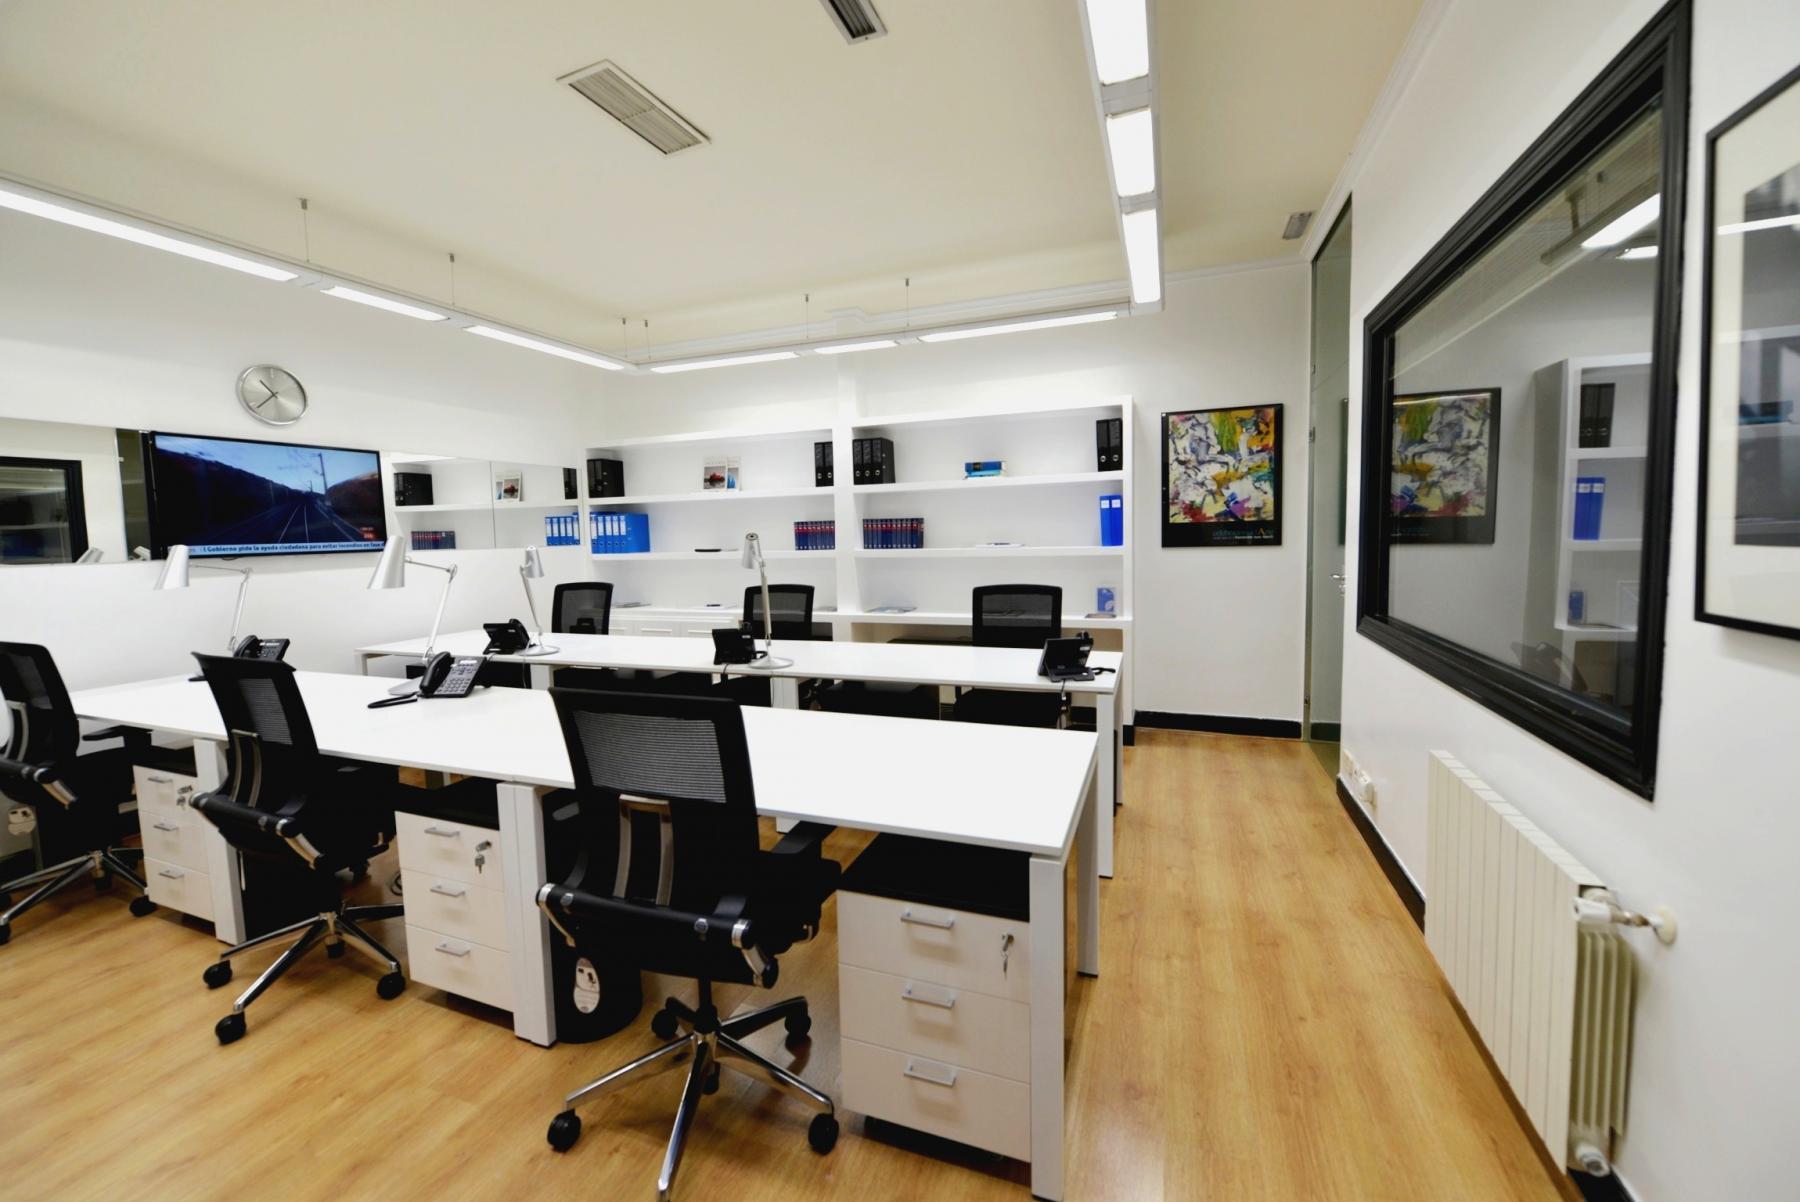 Alquilar oficinas Calle de Velázquez 94, Madrid (5)